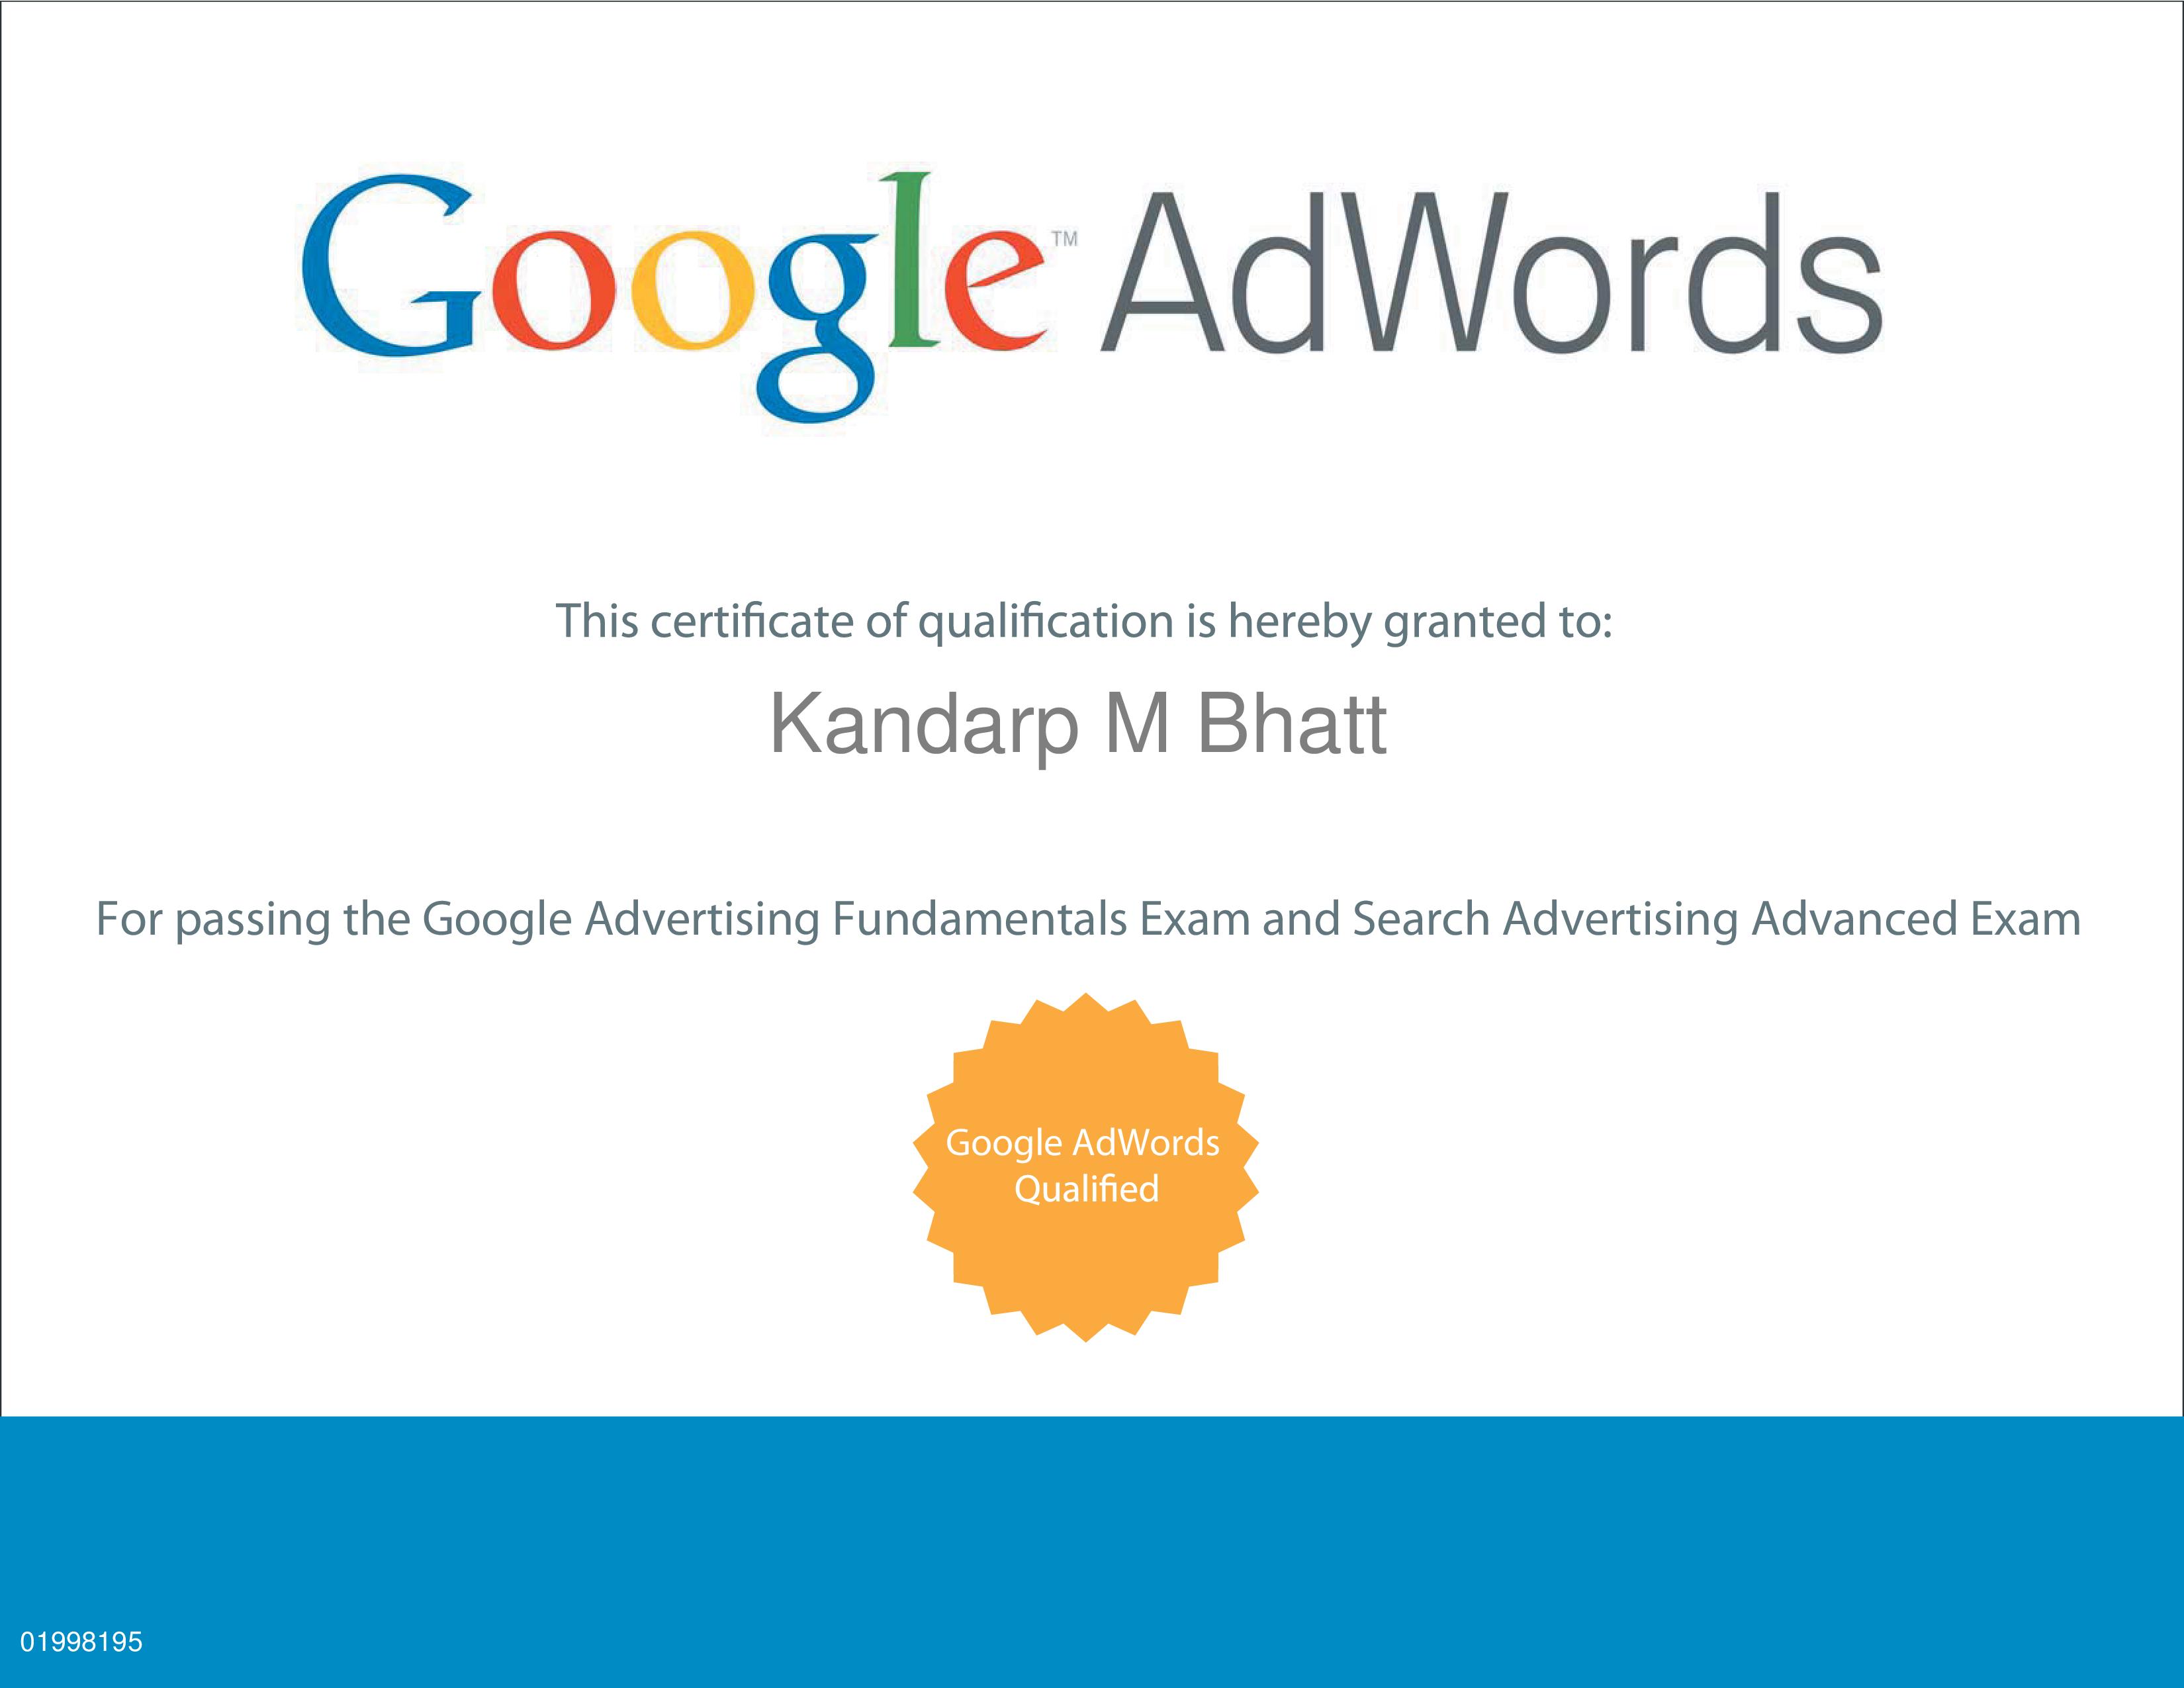 Should I Go For New Google Adwords Partner Certification Exam